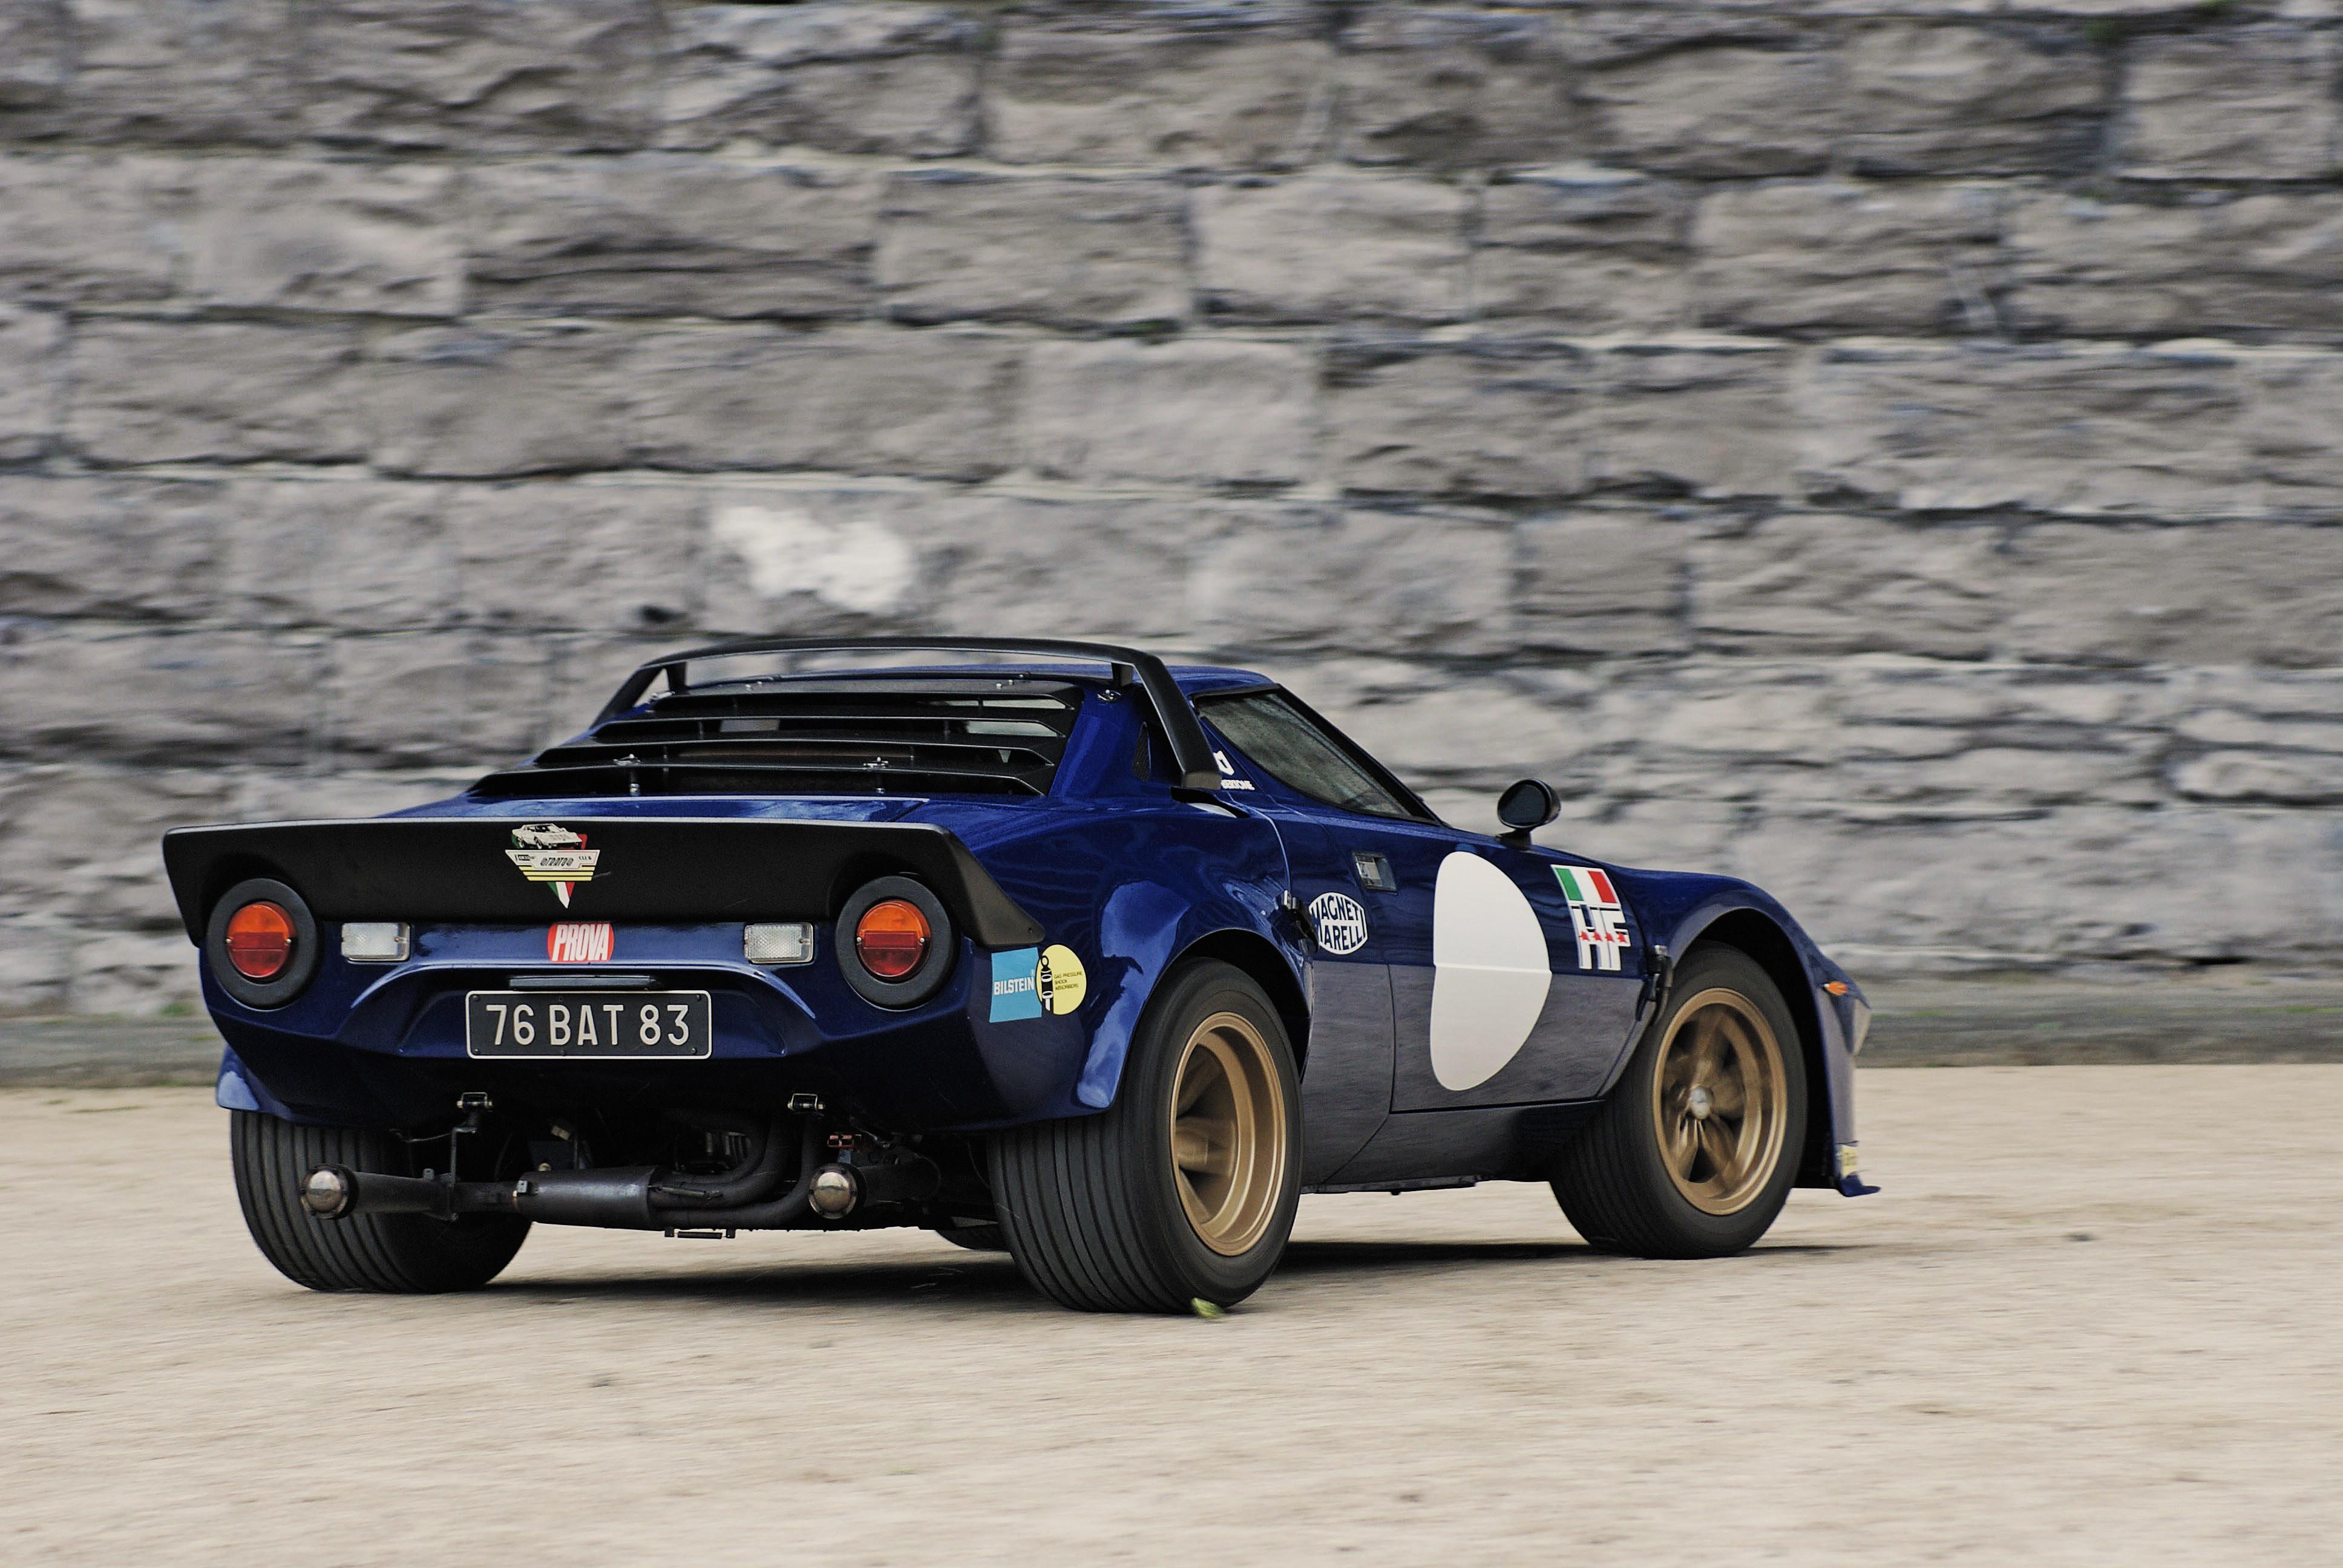 Wallpaper 3872x2592 Px Classic Car Lancia Stratos Rally Cars